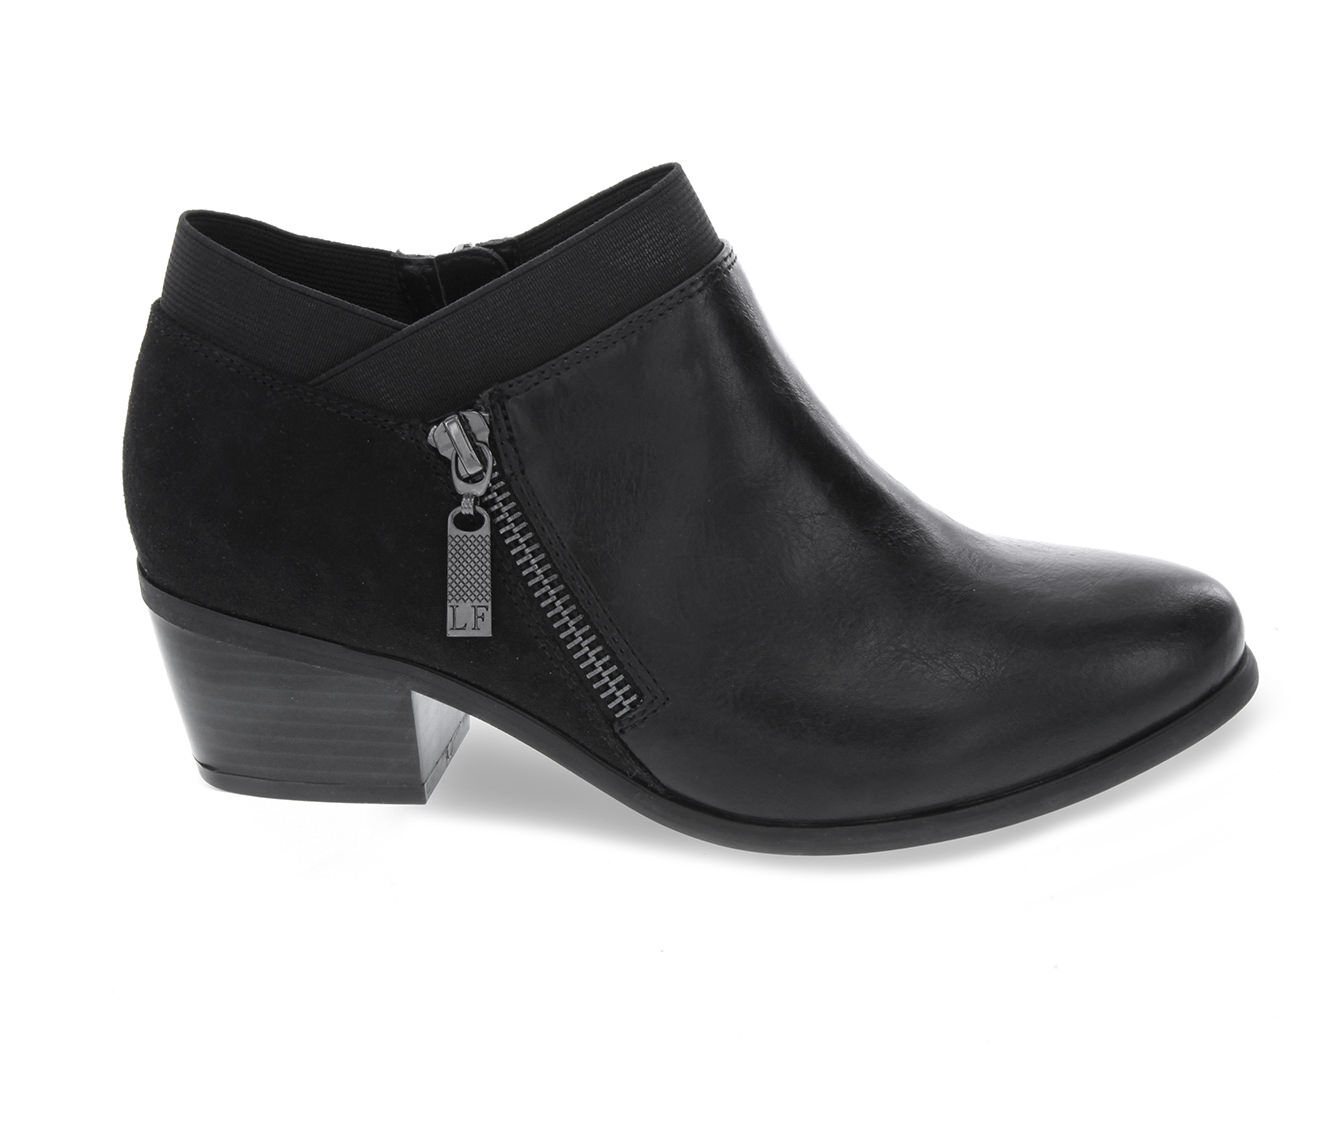 buy classic Women's London Fog Harper Shoes Black Smooth